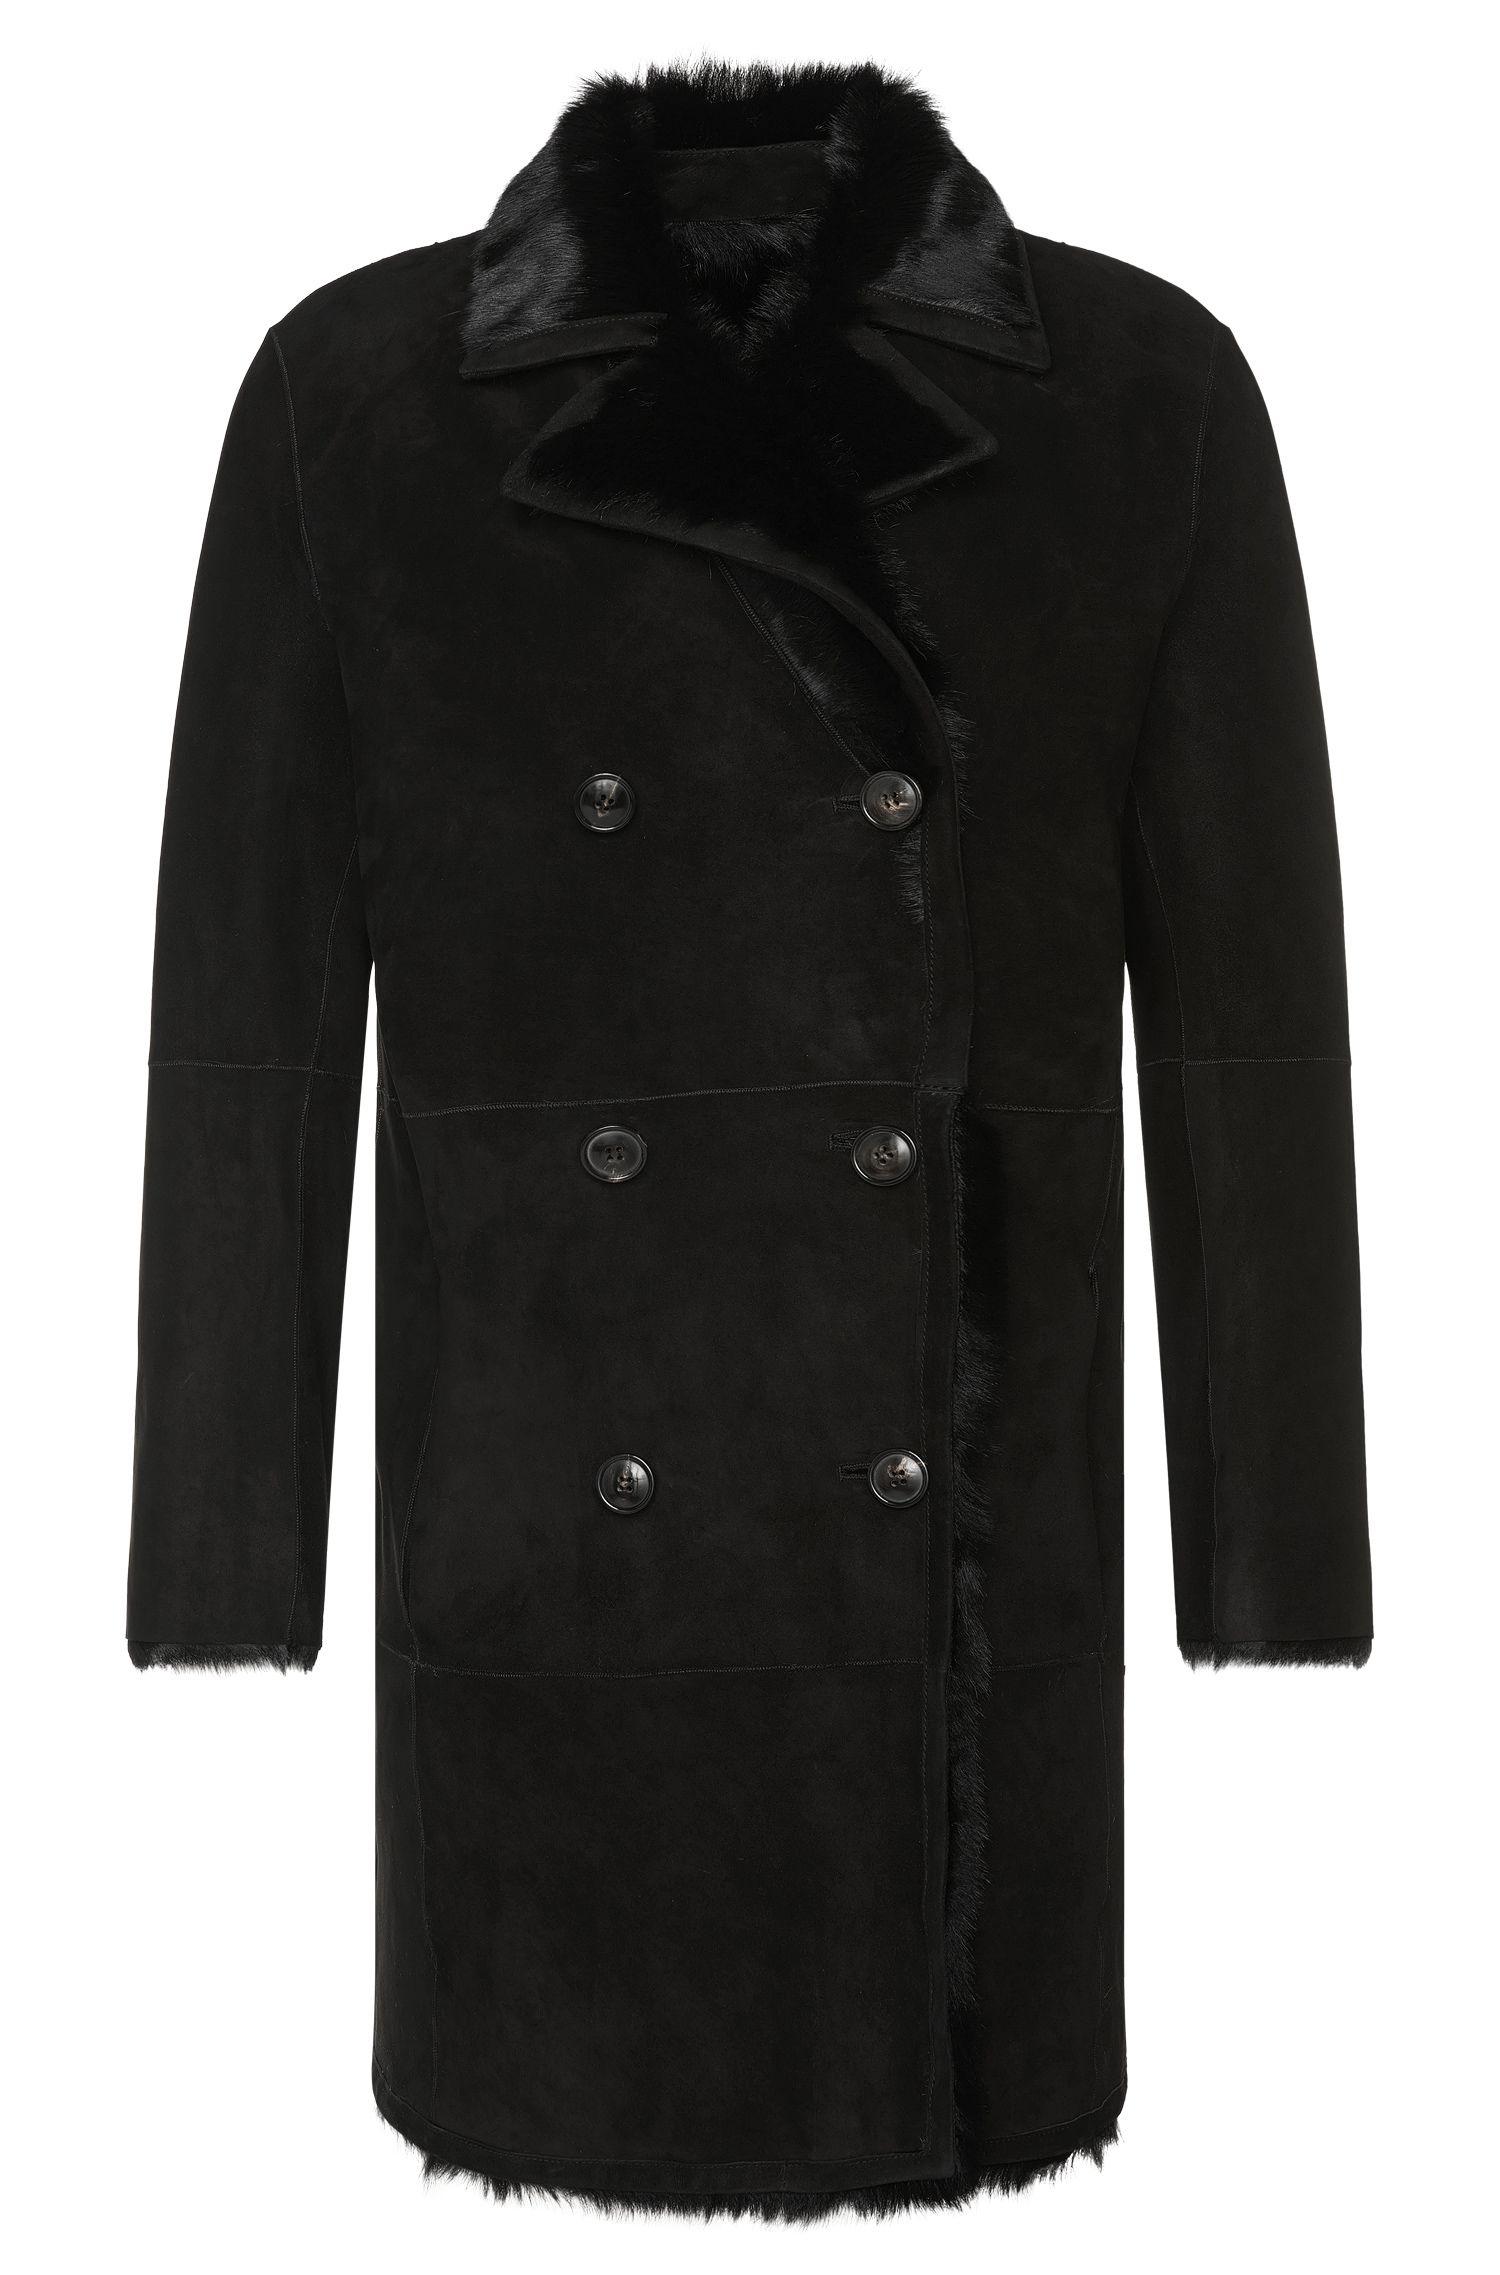 'Ludon' | Reversible Calfskin, Shearling Pea Coat